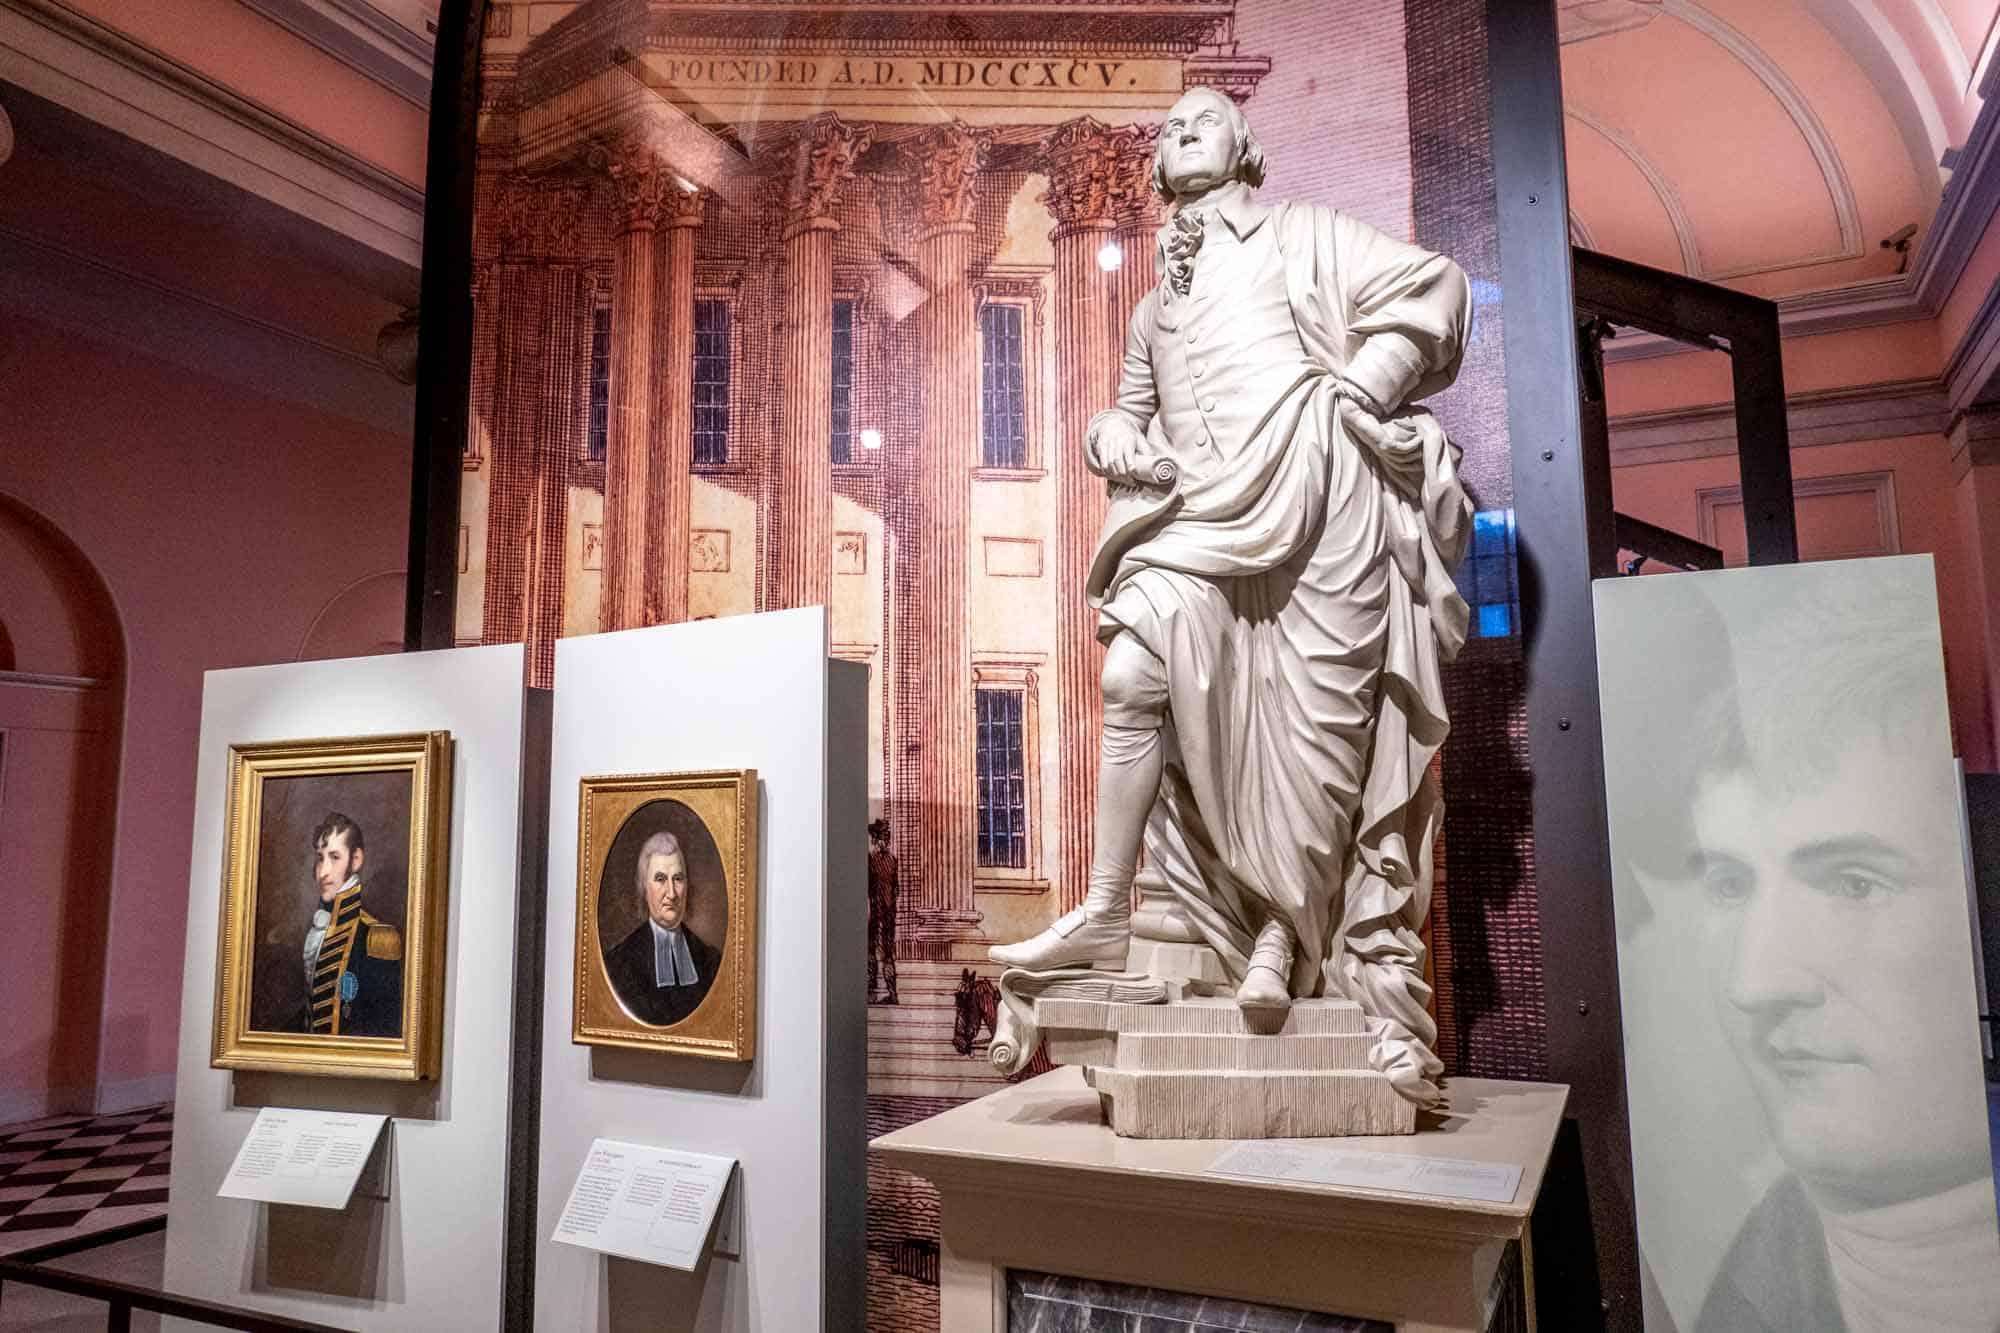 Statue of George Washington beside portraits of men